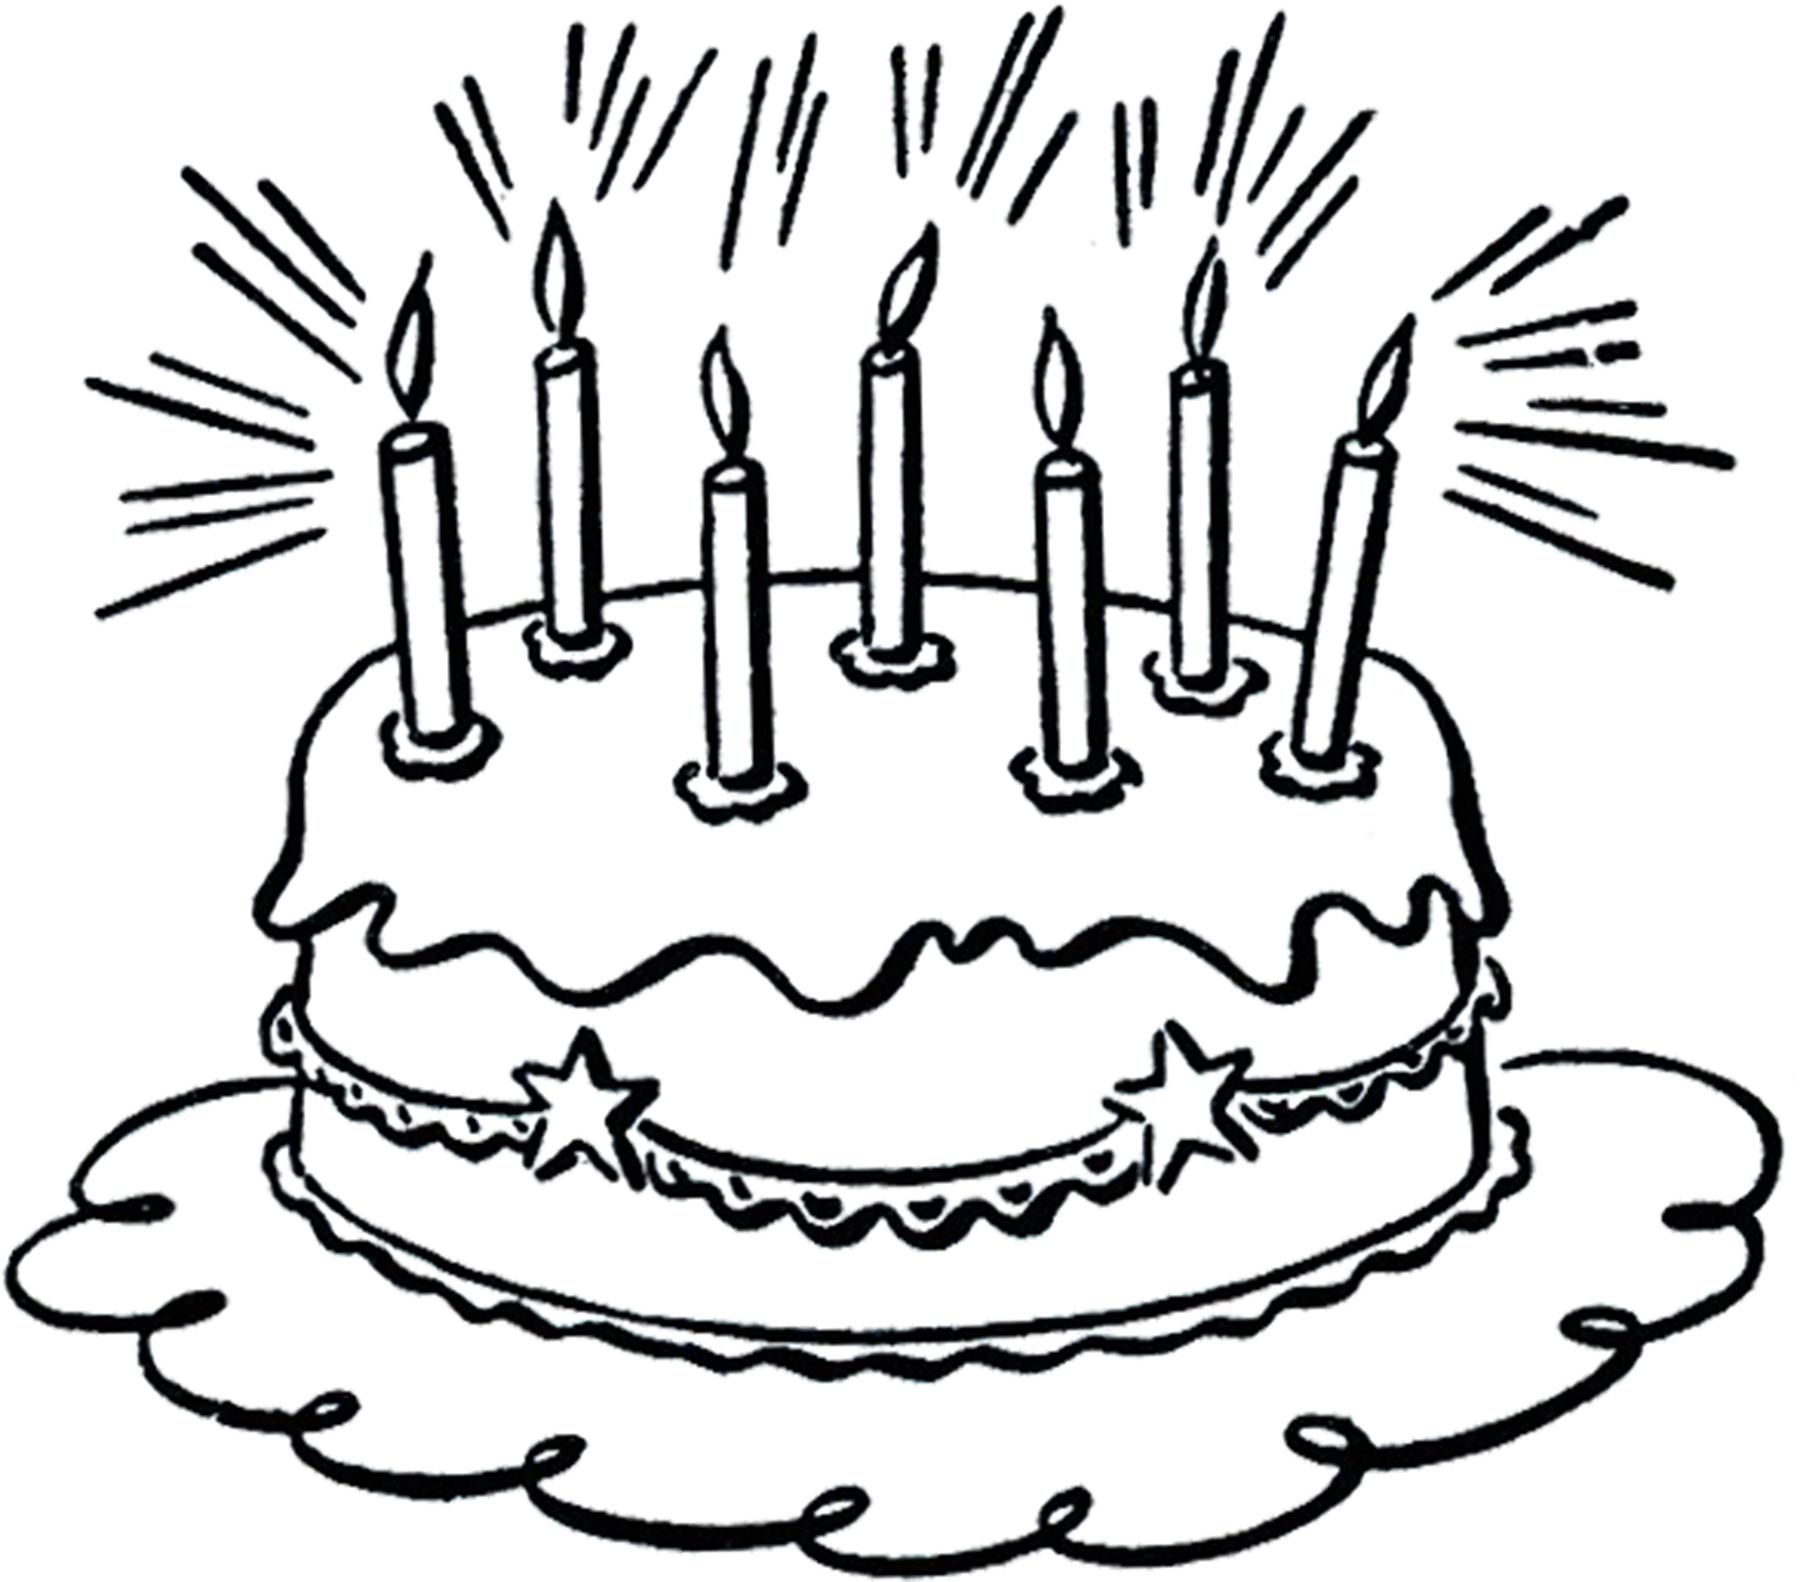 1800x1582 Birthday Cake Line Drawing Vintage Birthday Cake Line Art